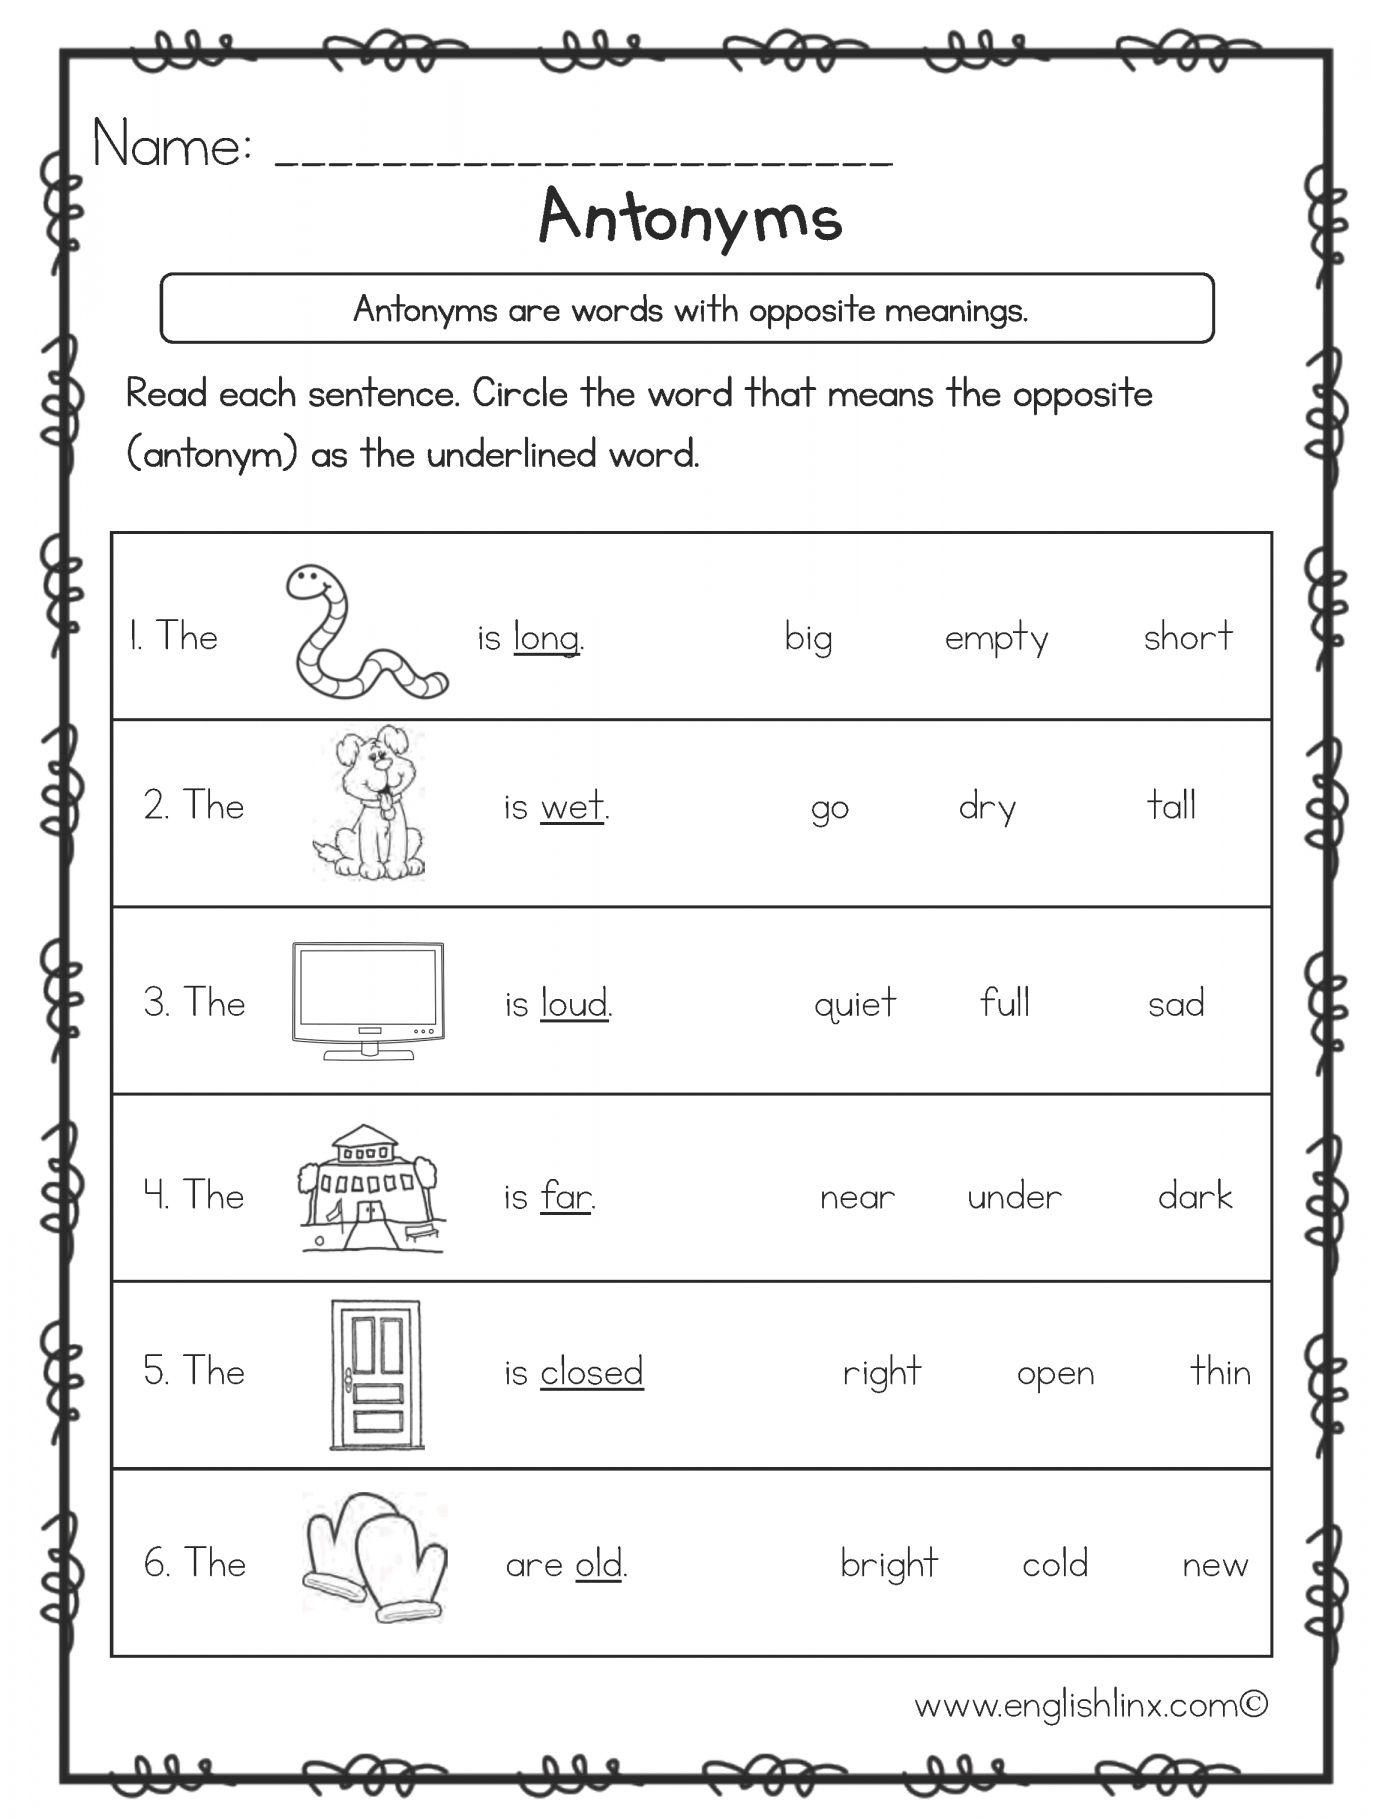 9 Antonyms Worksheets 2nd Grade